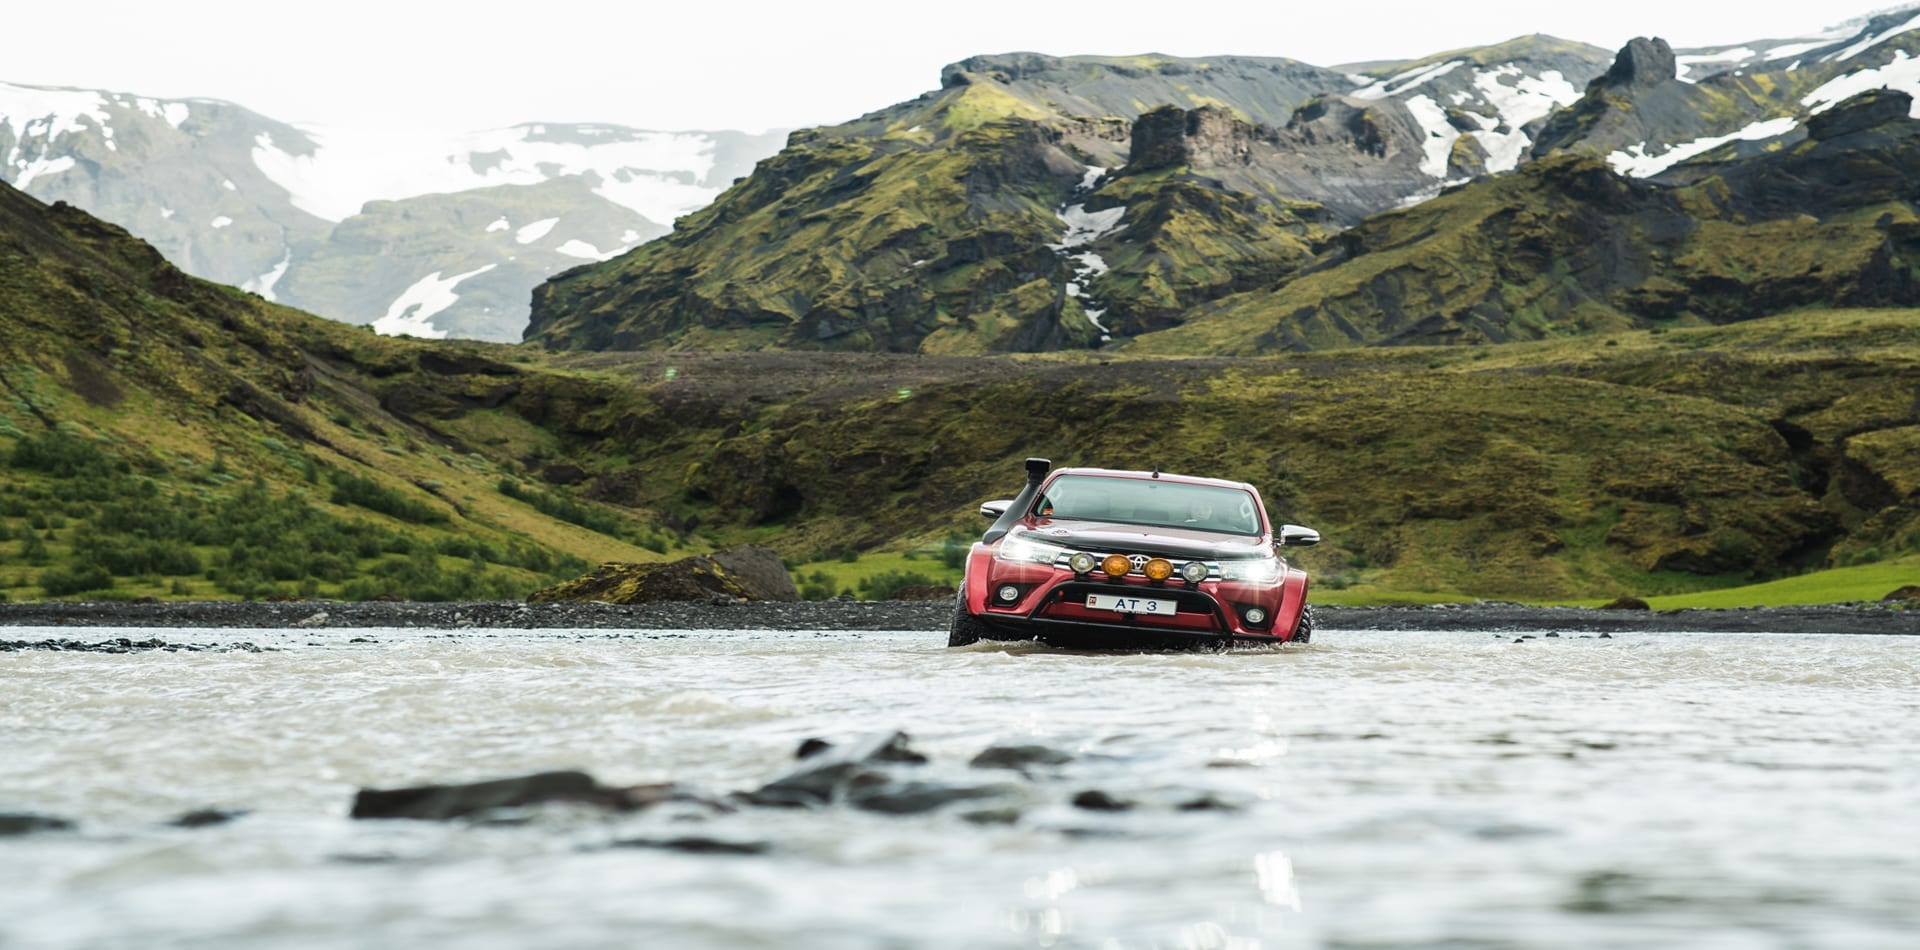 Iceland Driving Adventure